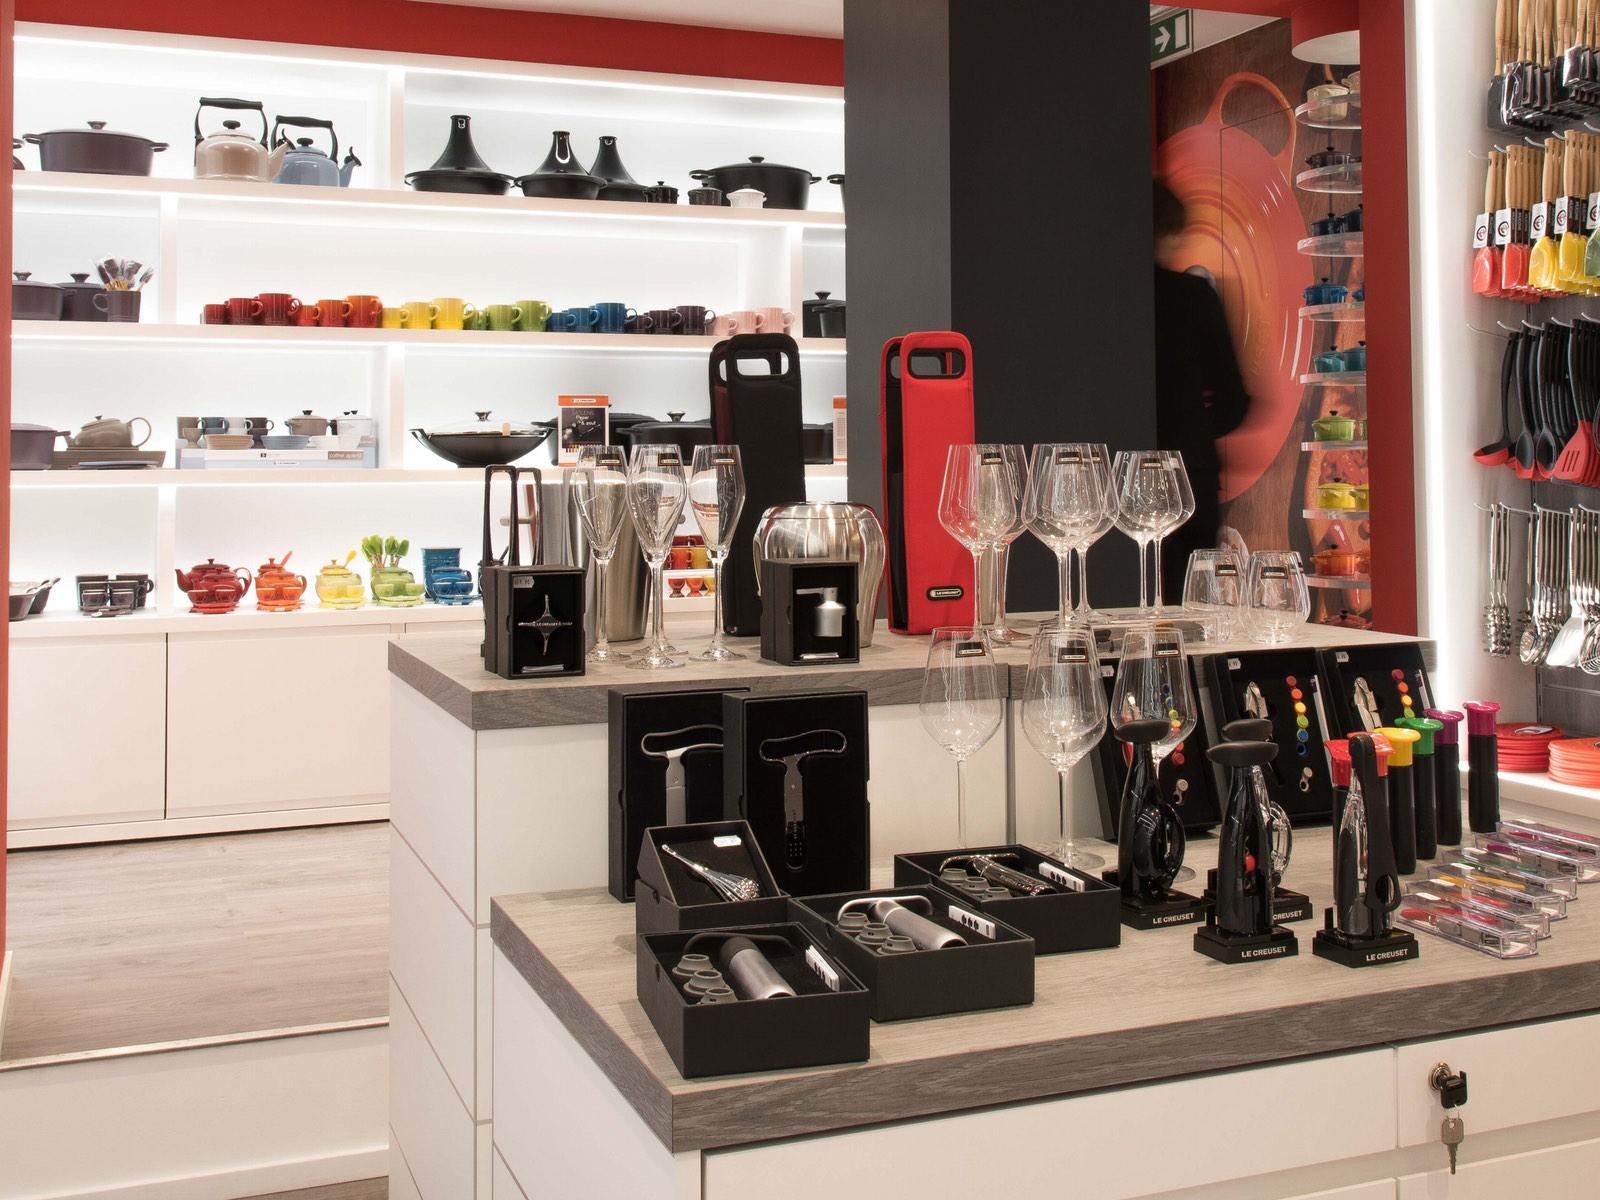 screwpull brandstore